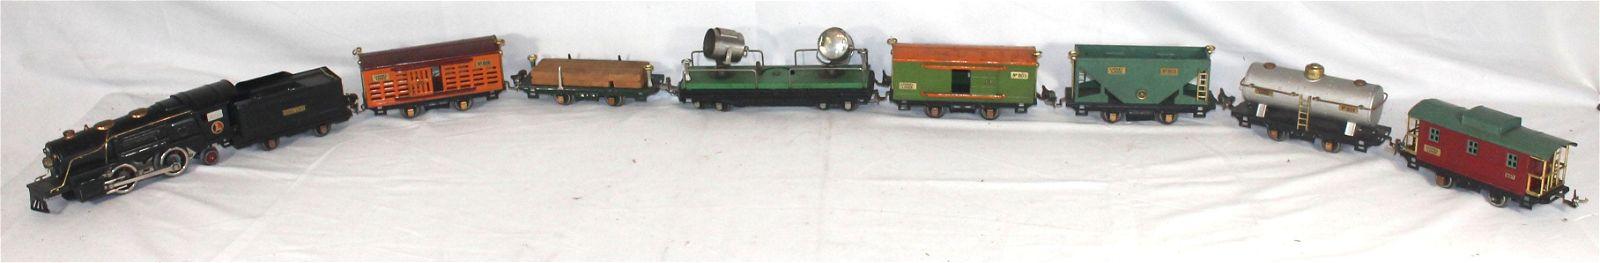 Lionel train cars w O Gauge loco & tender plus 7 cars -